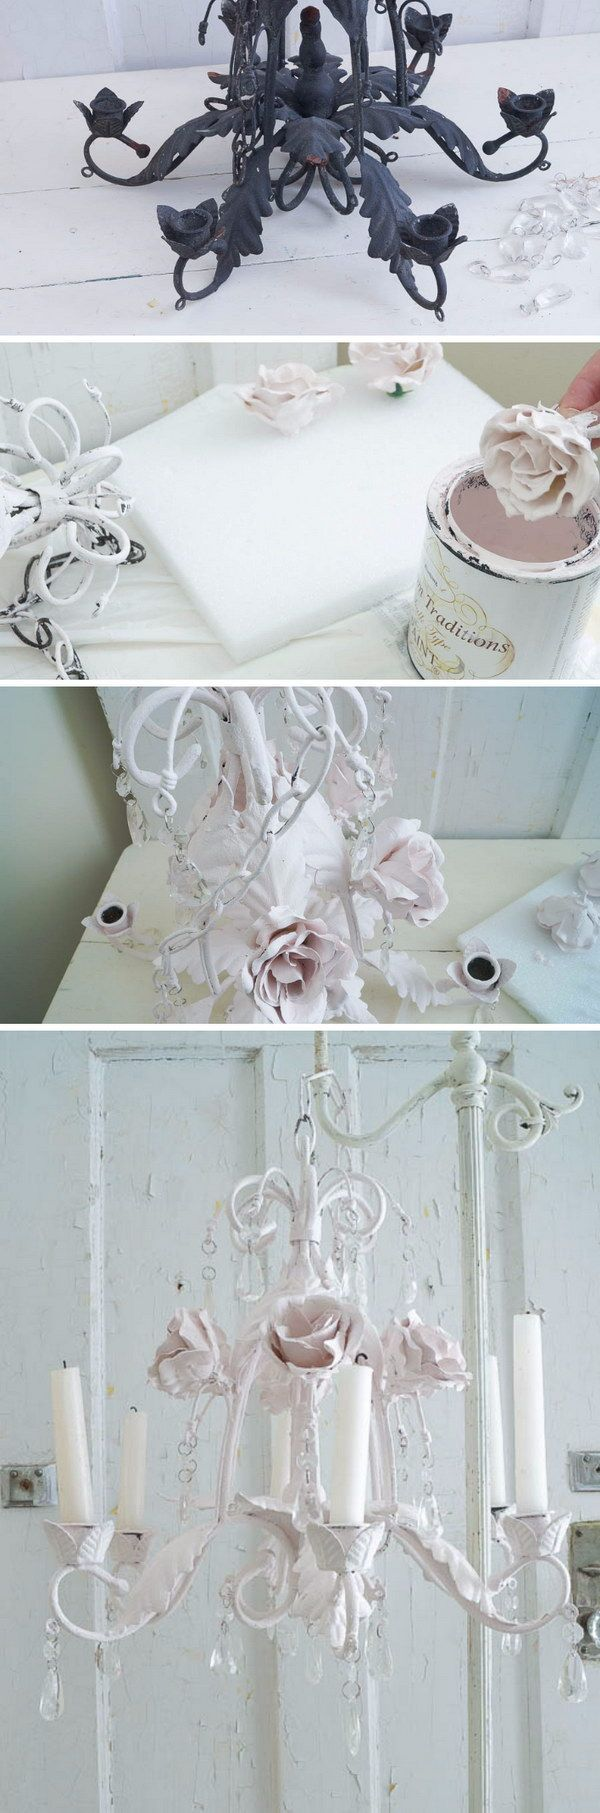 Romantic Shabby Chic DIY Project Ideas & Tutorials   Home ...